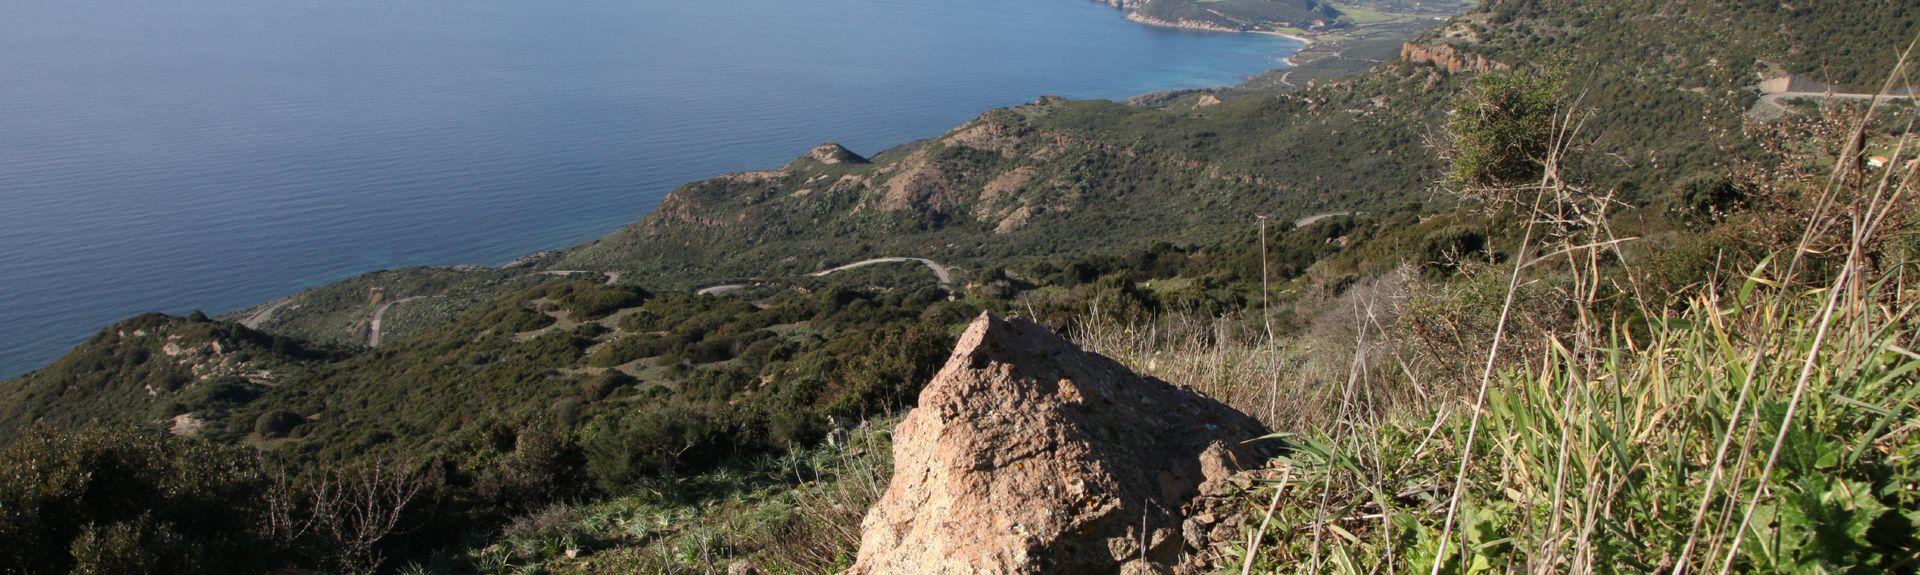 Monteleone Rocca Doria, Sardinien, Italien